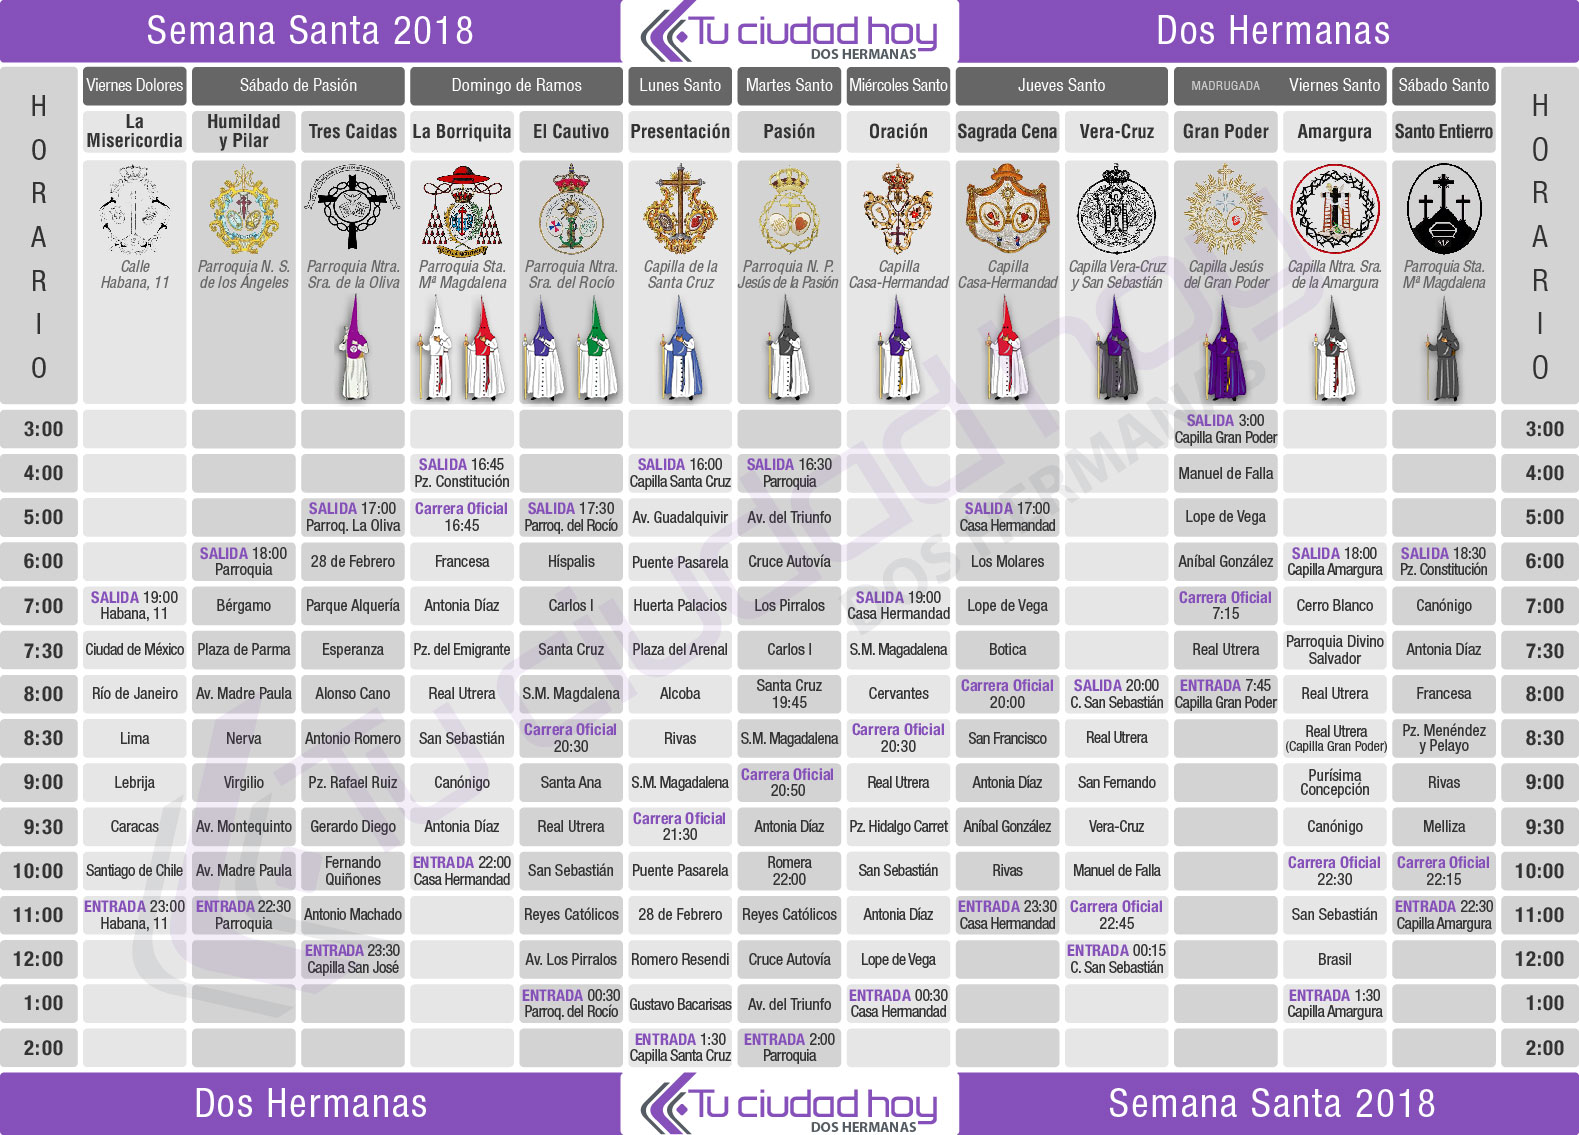 Cuadrante Semana Santa Dos-Hermanas 2018